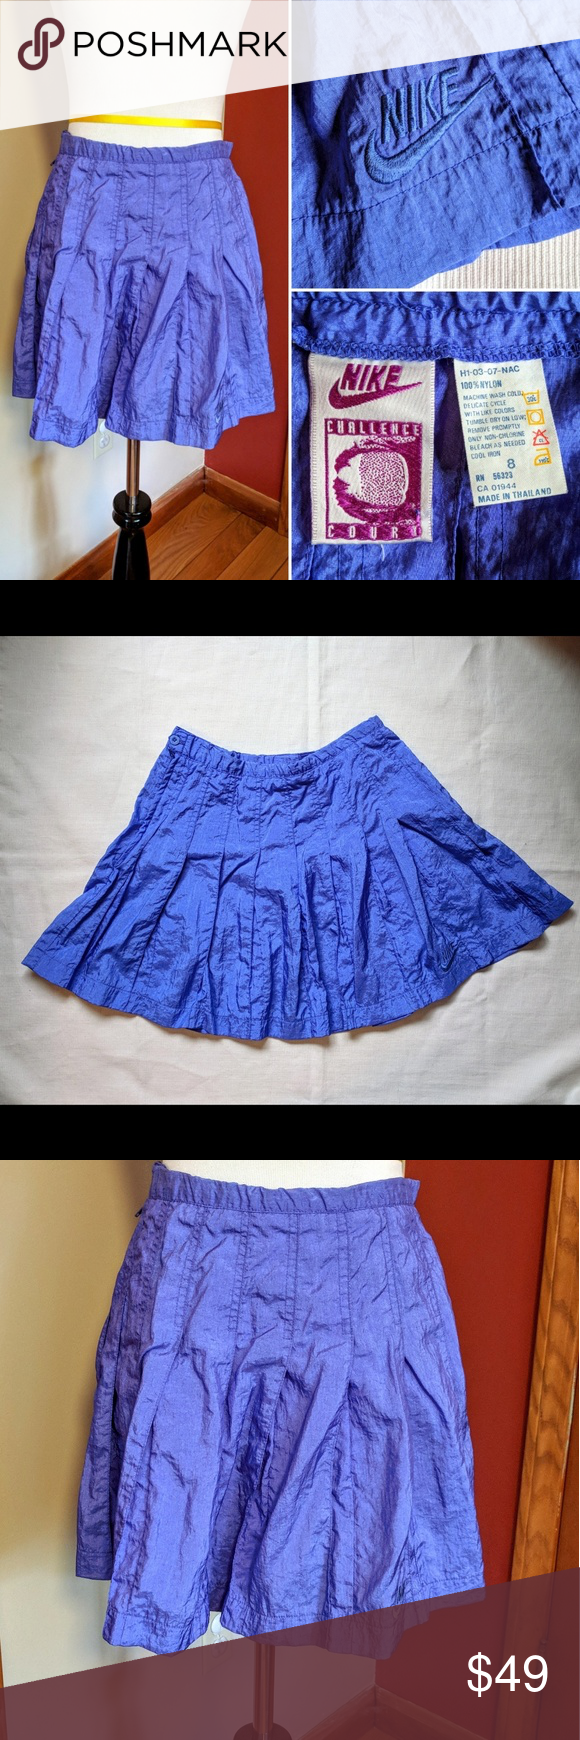 Vintage Nike 80s 90s Challenge Court Tennis Skirt Tennis Skirt Vintage Nike Clothes Design